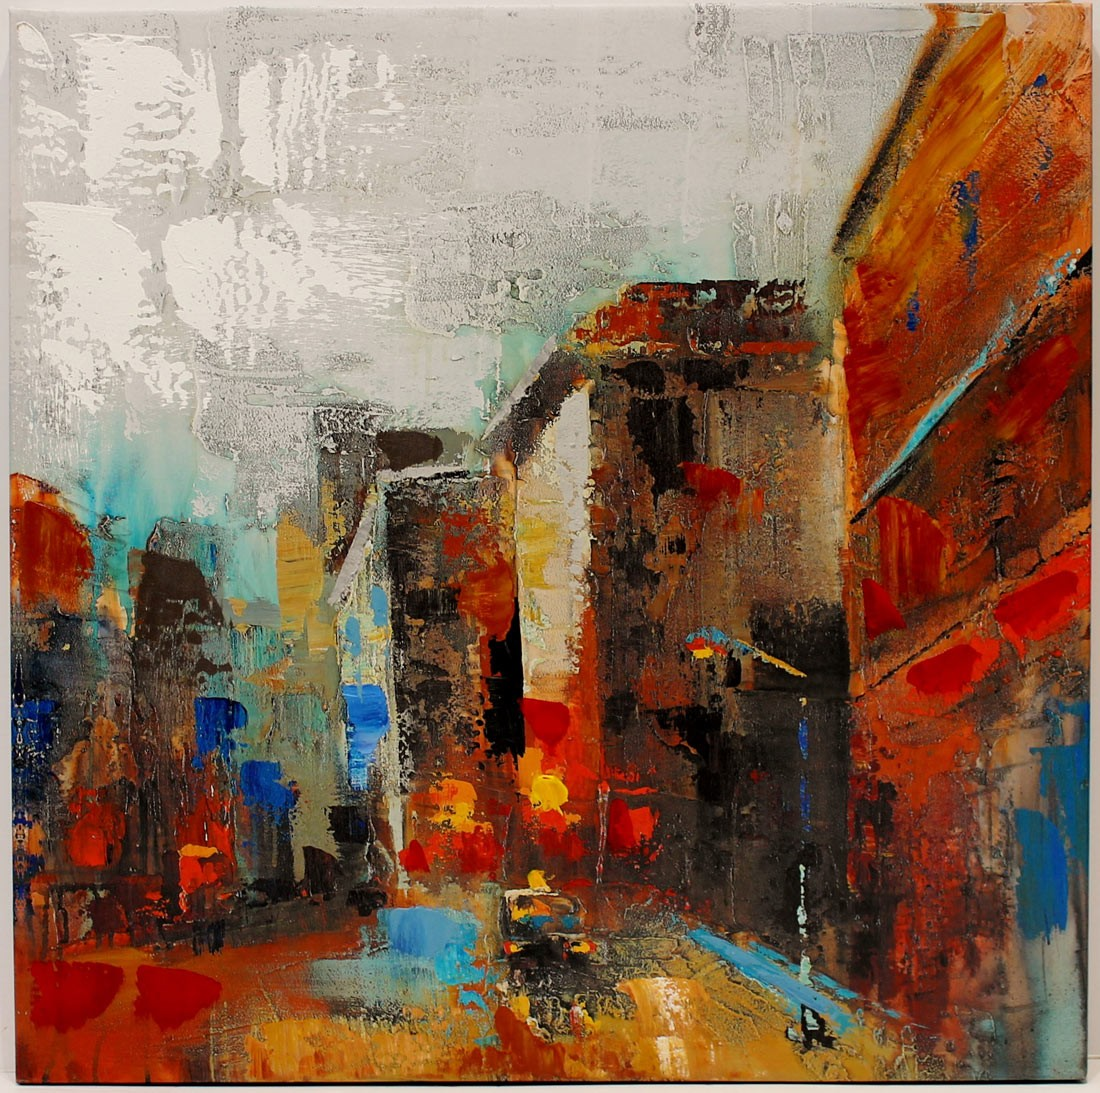 Anónimo: Vista urbana